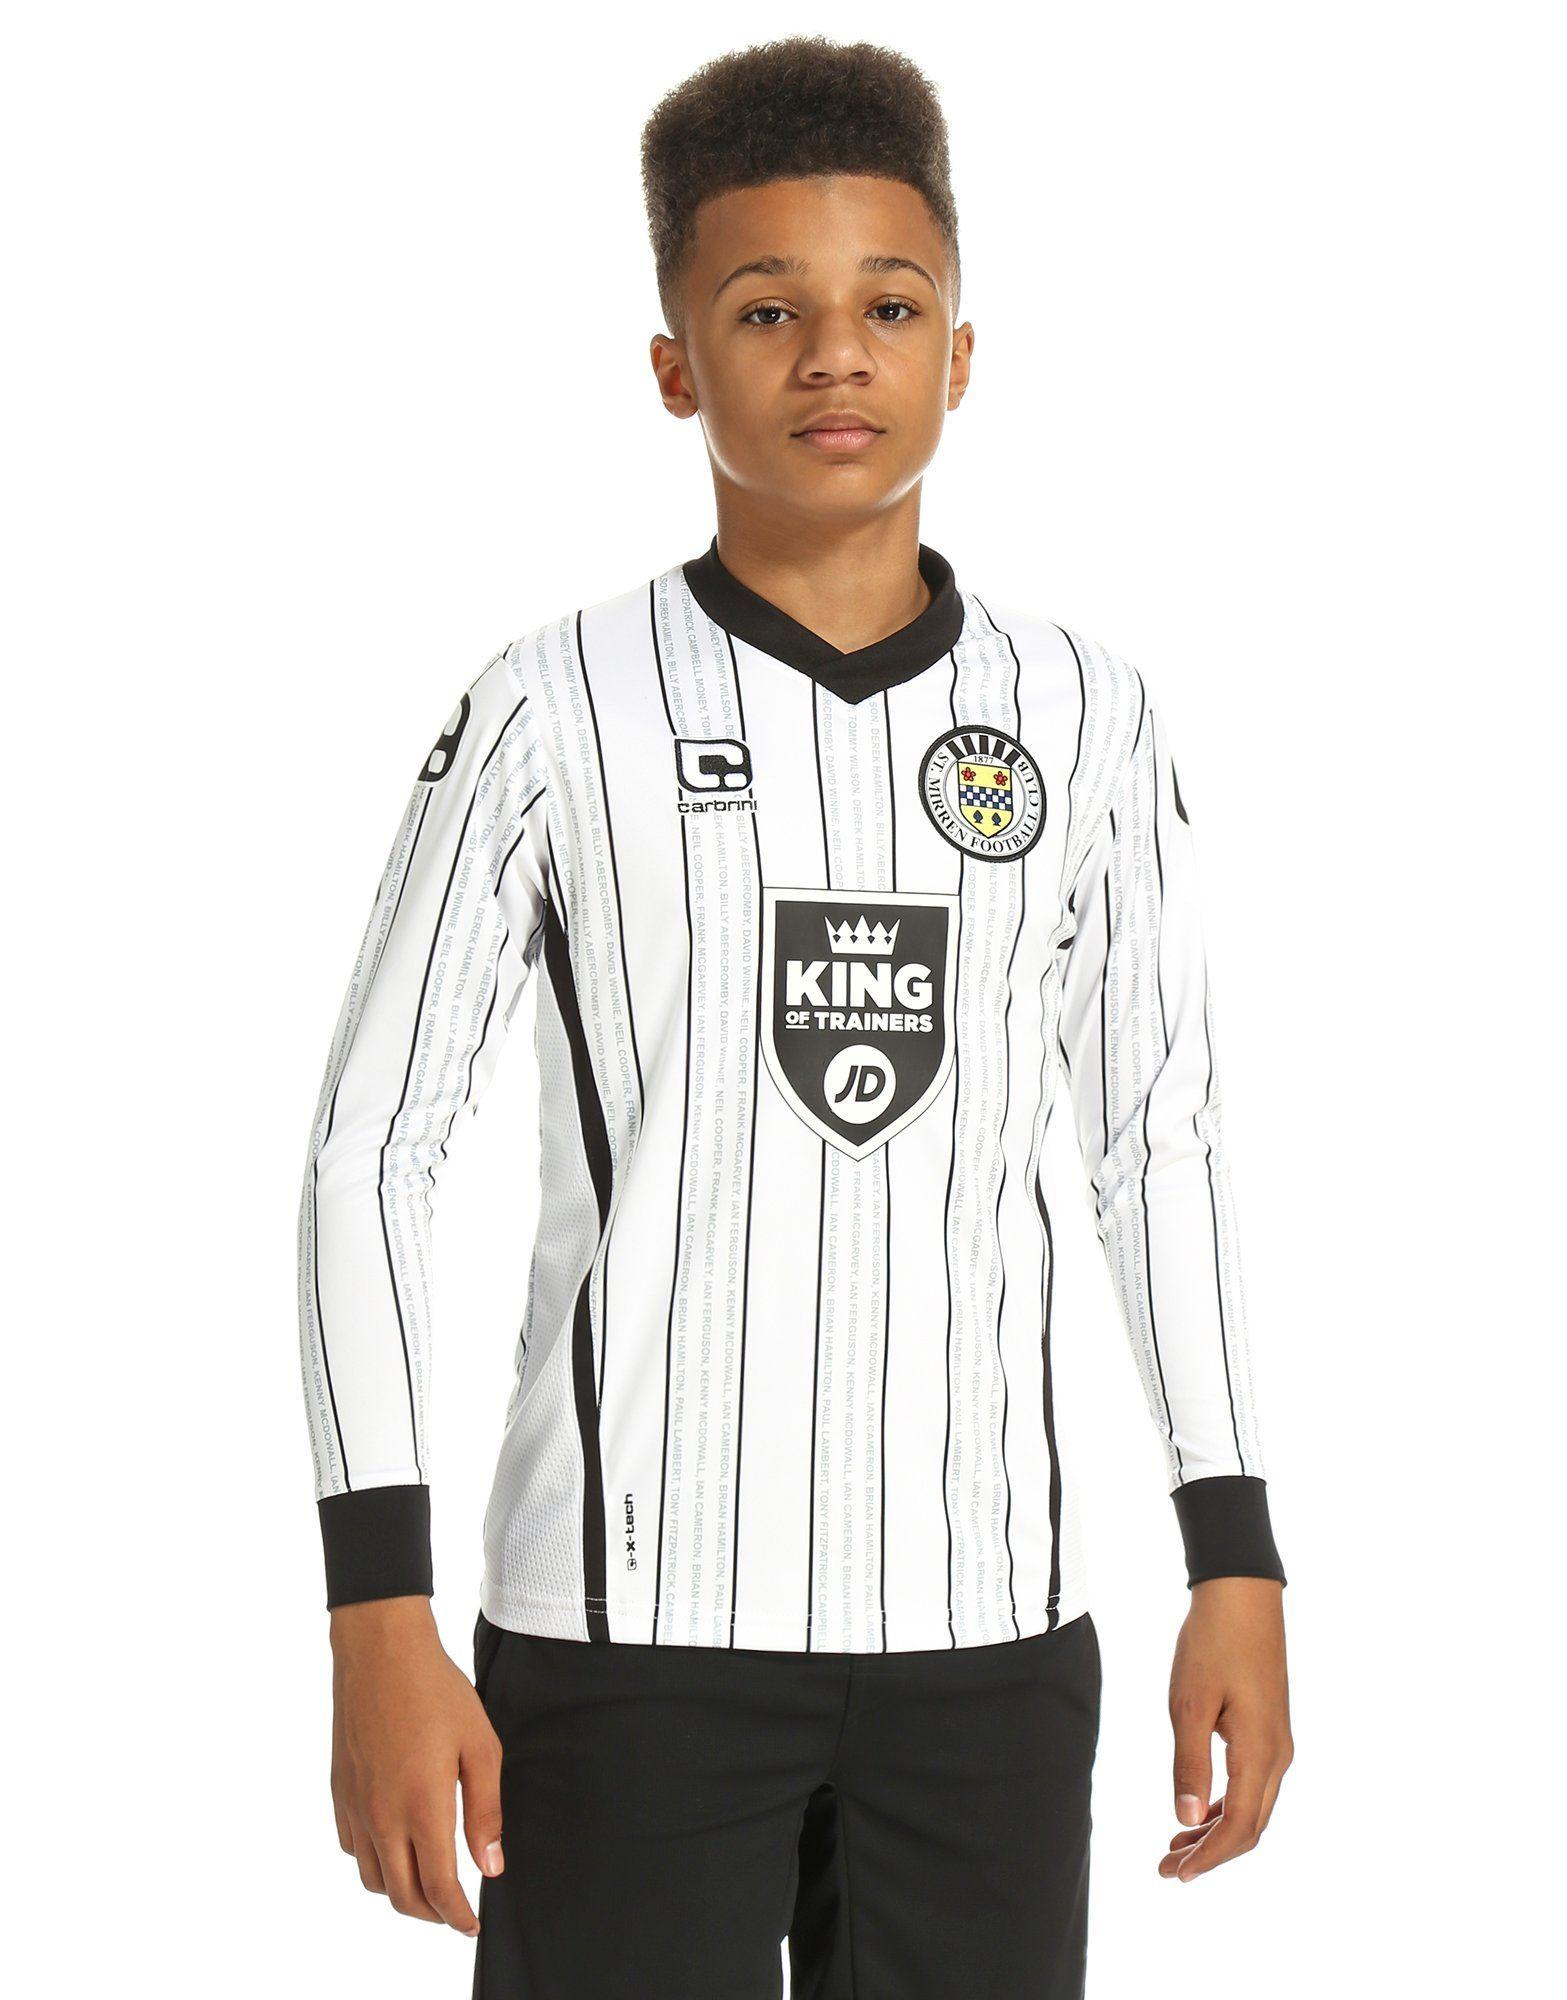 Carbrini St Mirren FC 2016/17 Home LS Shirt Jnr